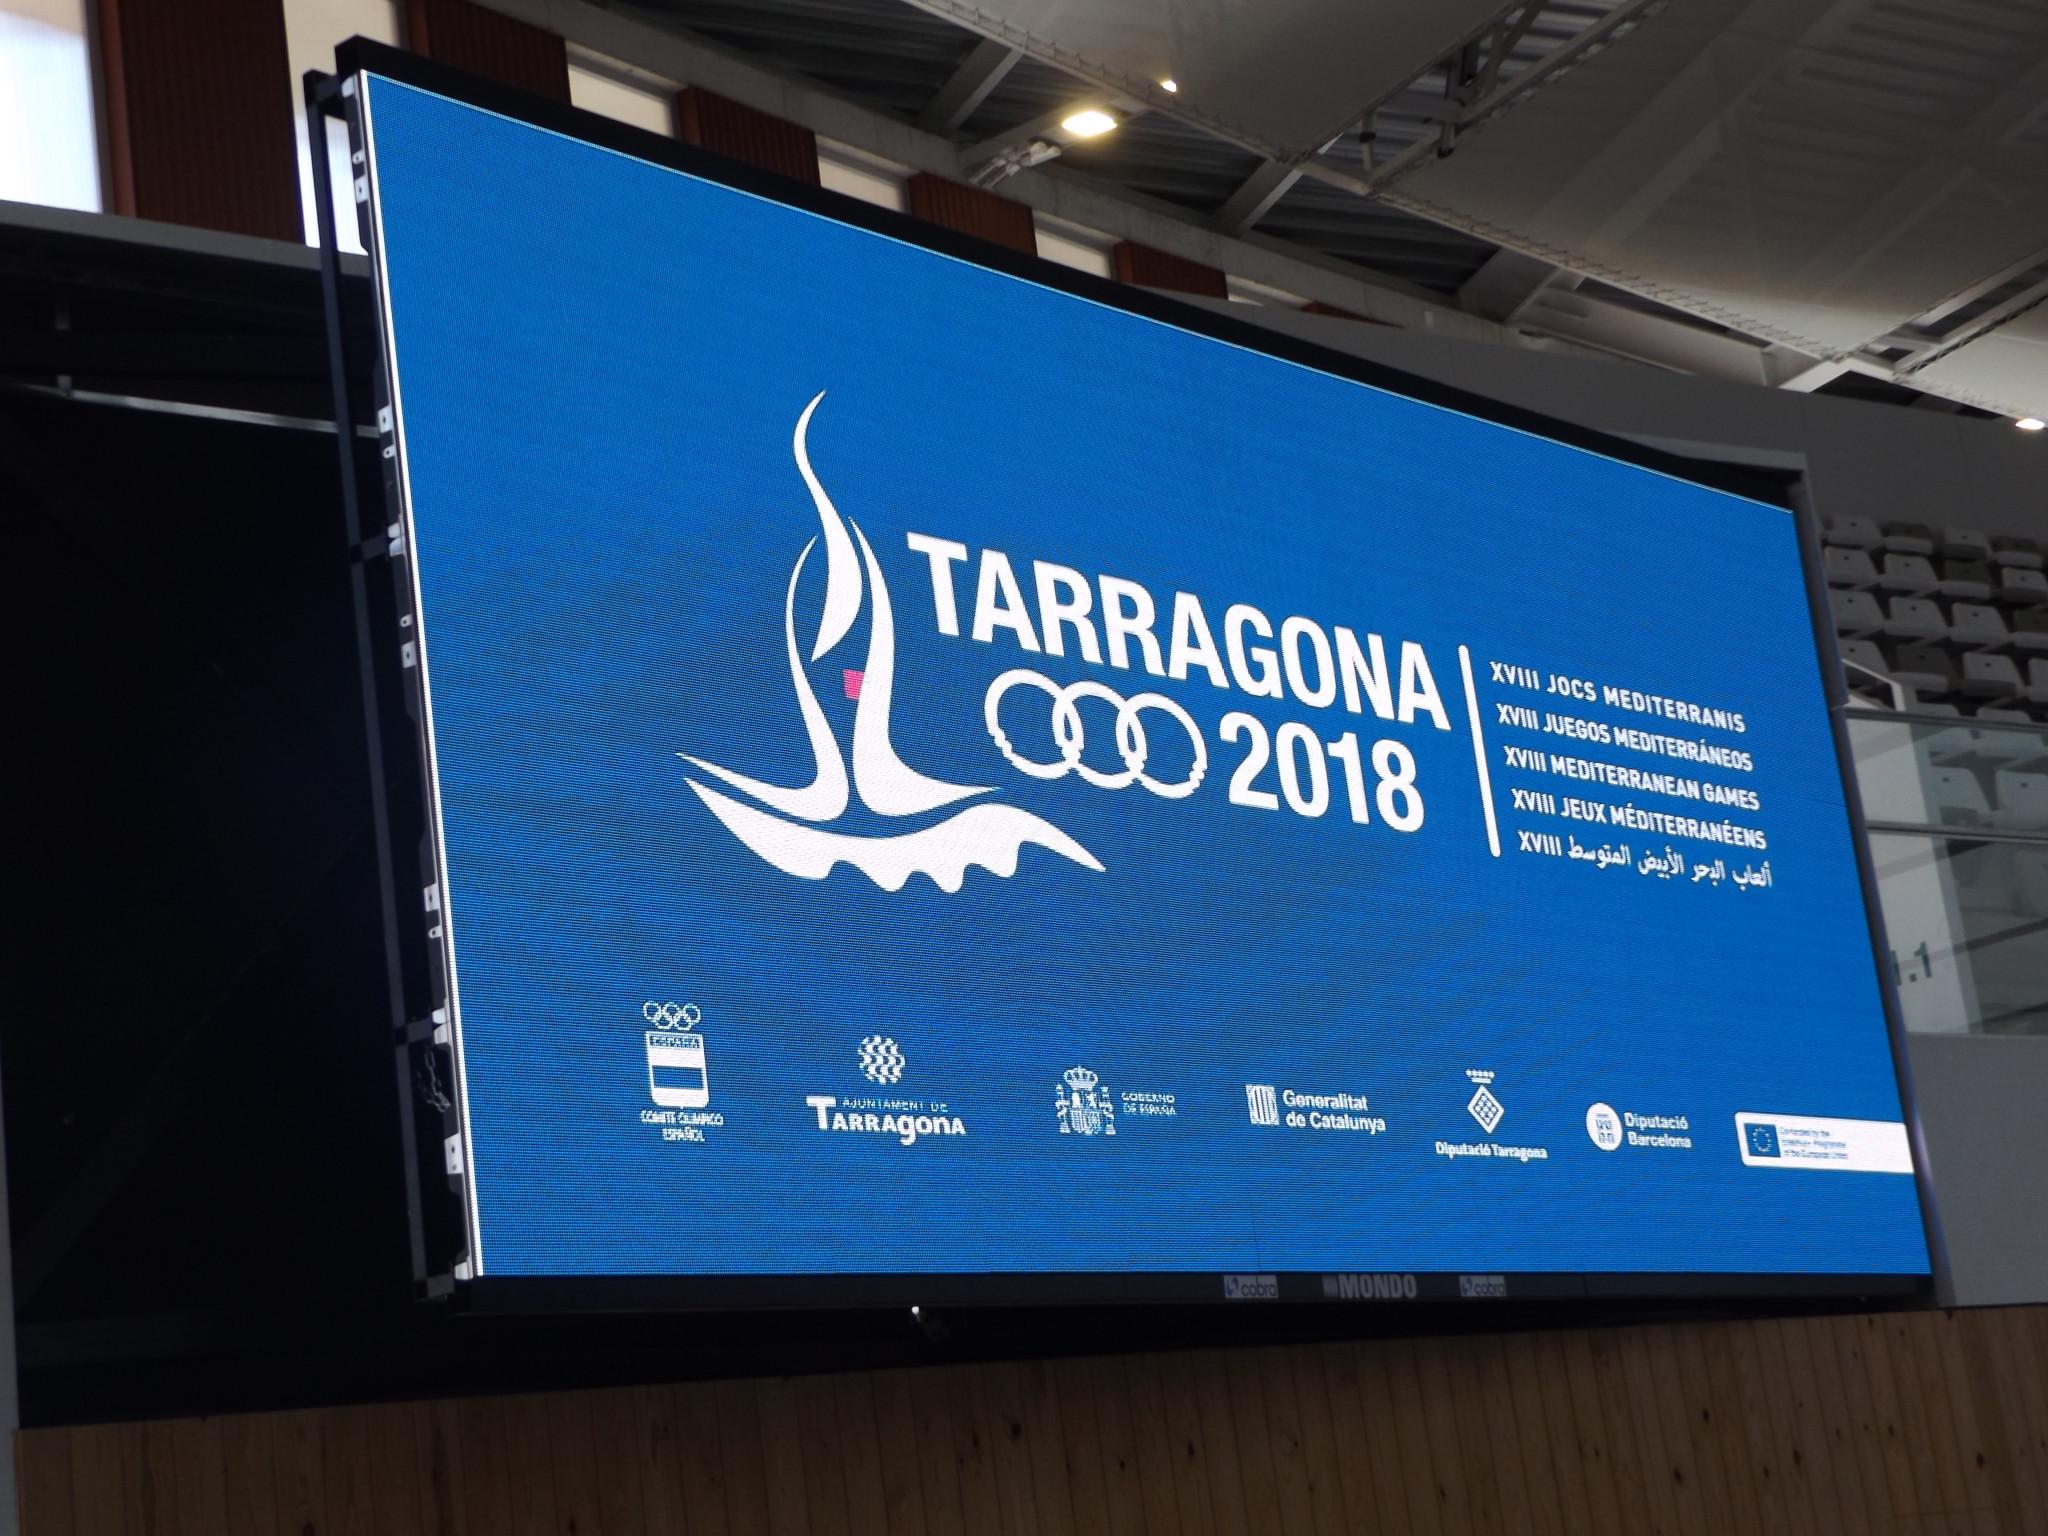 Abian wins home badminton gold for Spain at Mediterranean Games